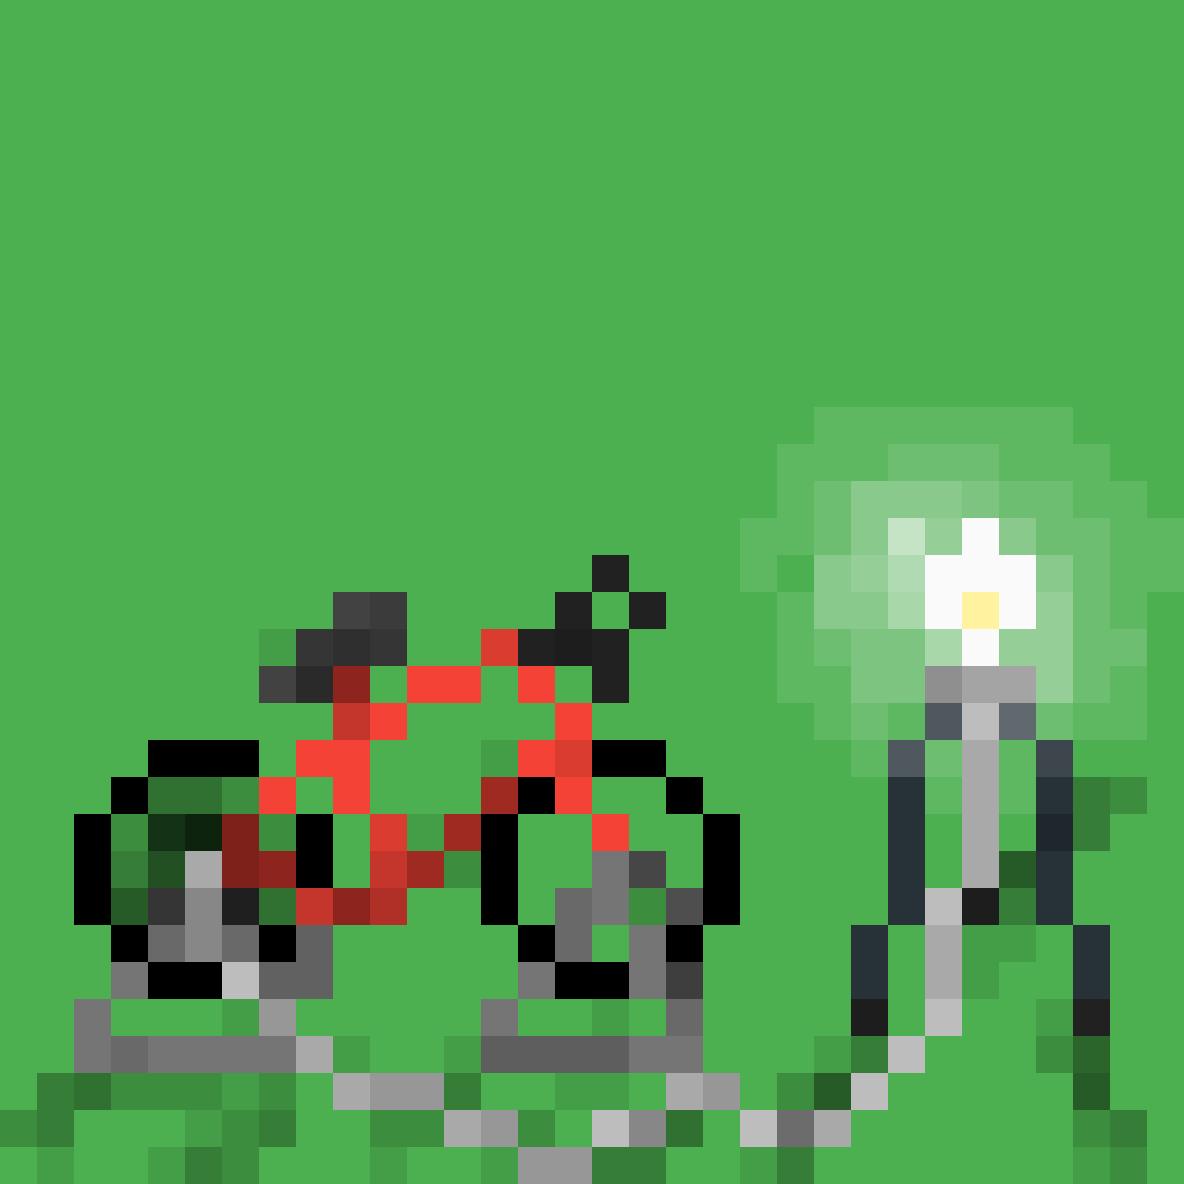 Bike by Derpy-Croc